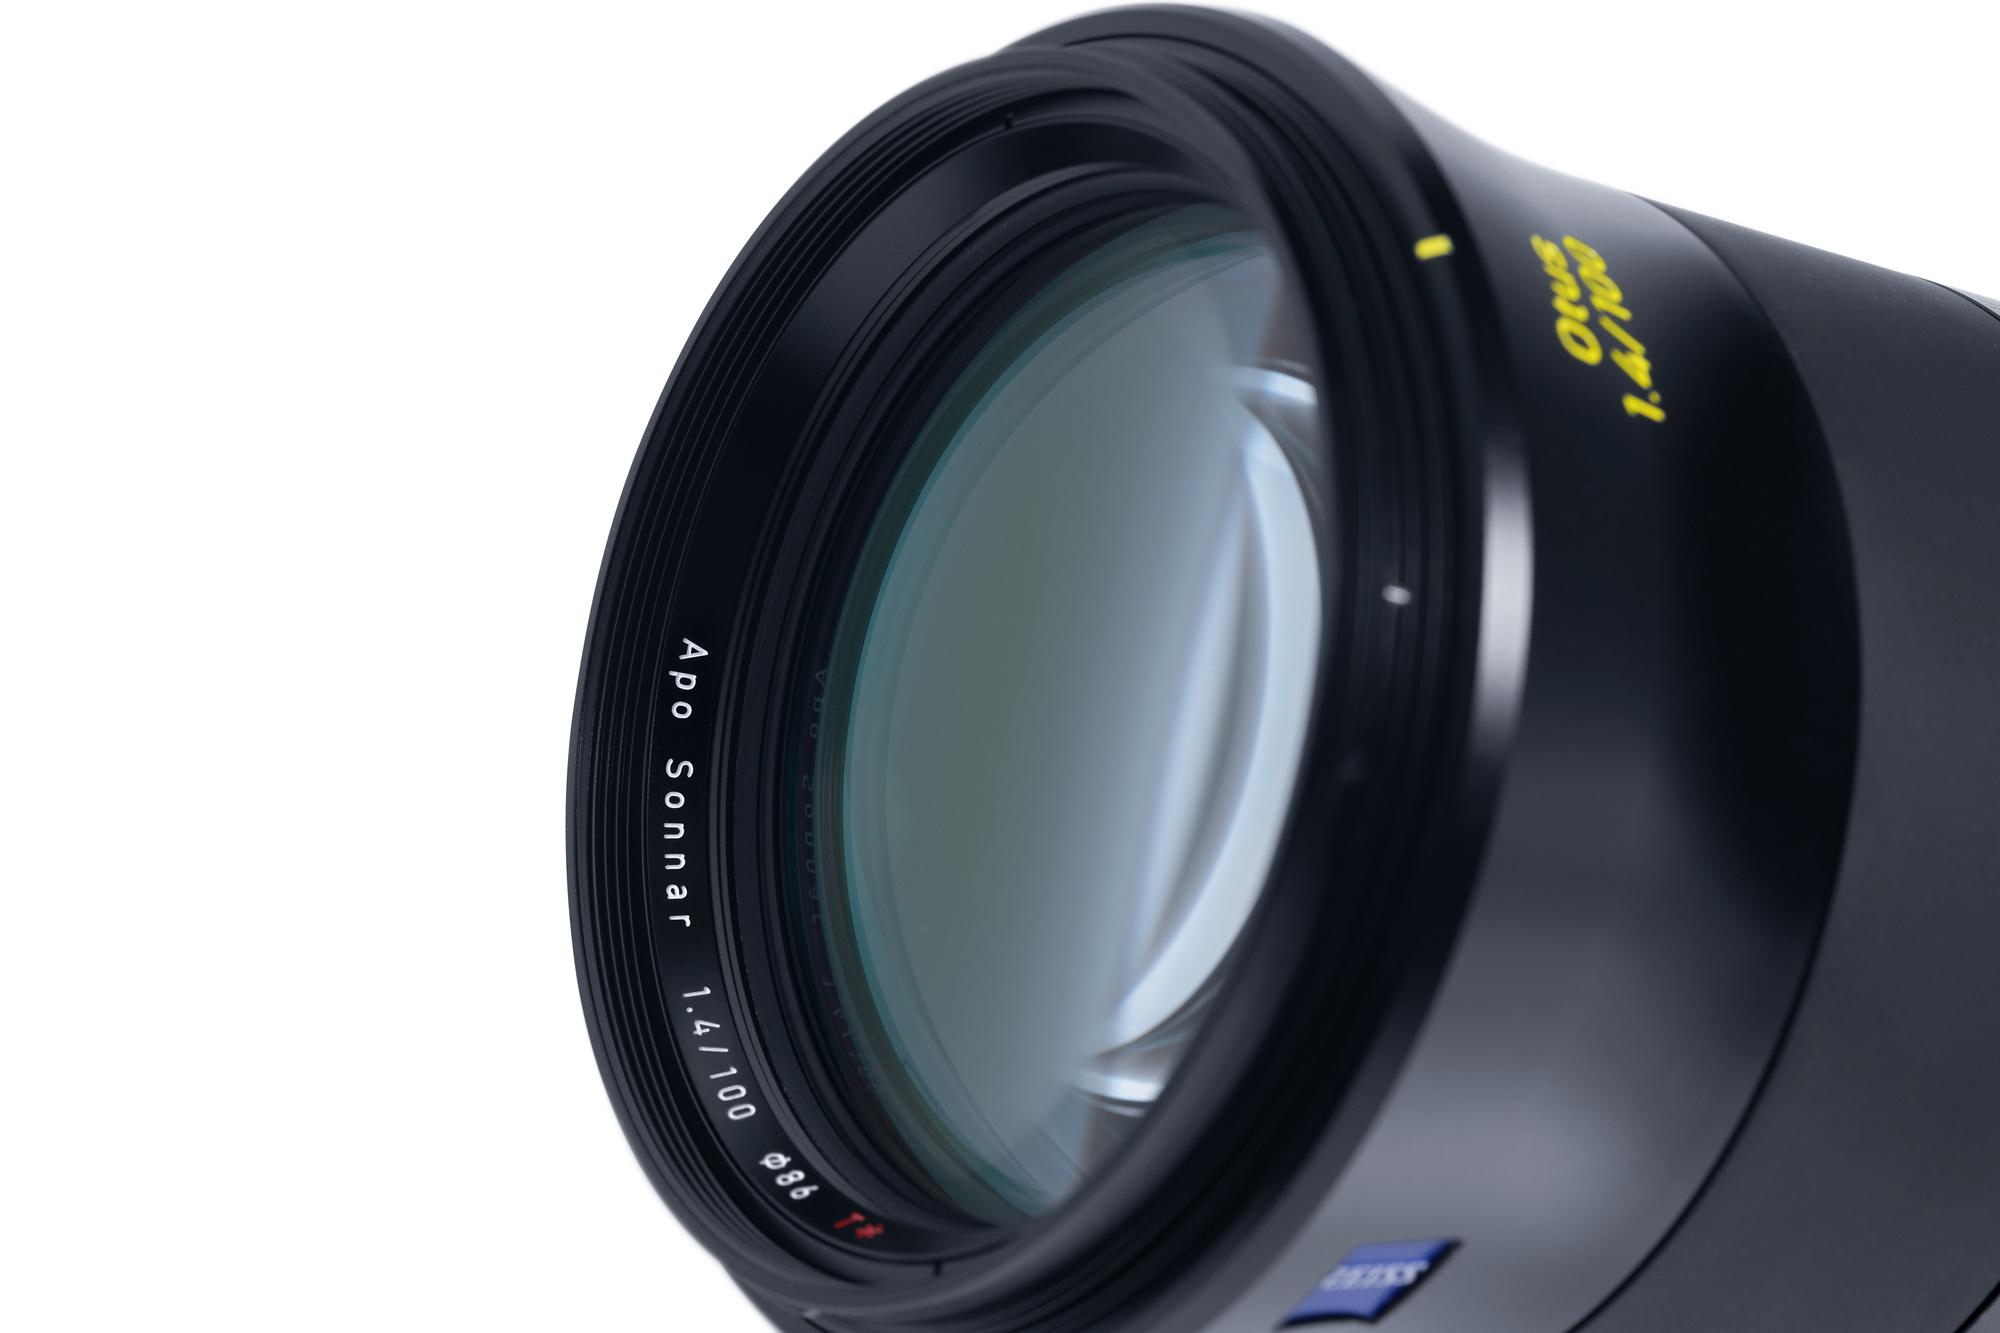 ZEISS Otus 1.4/100 lens